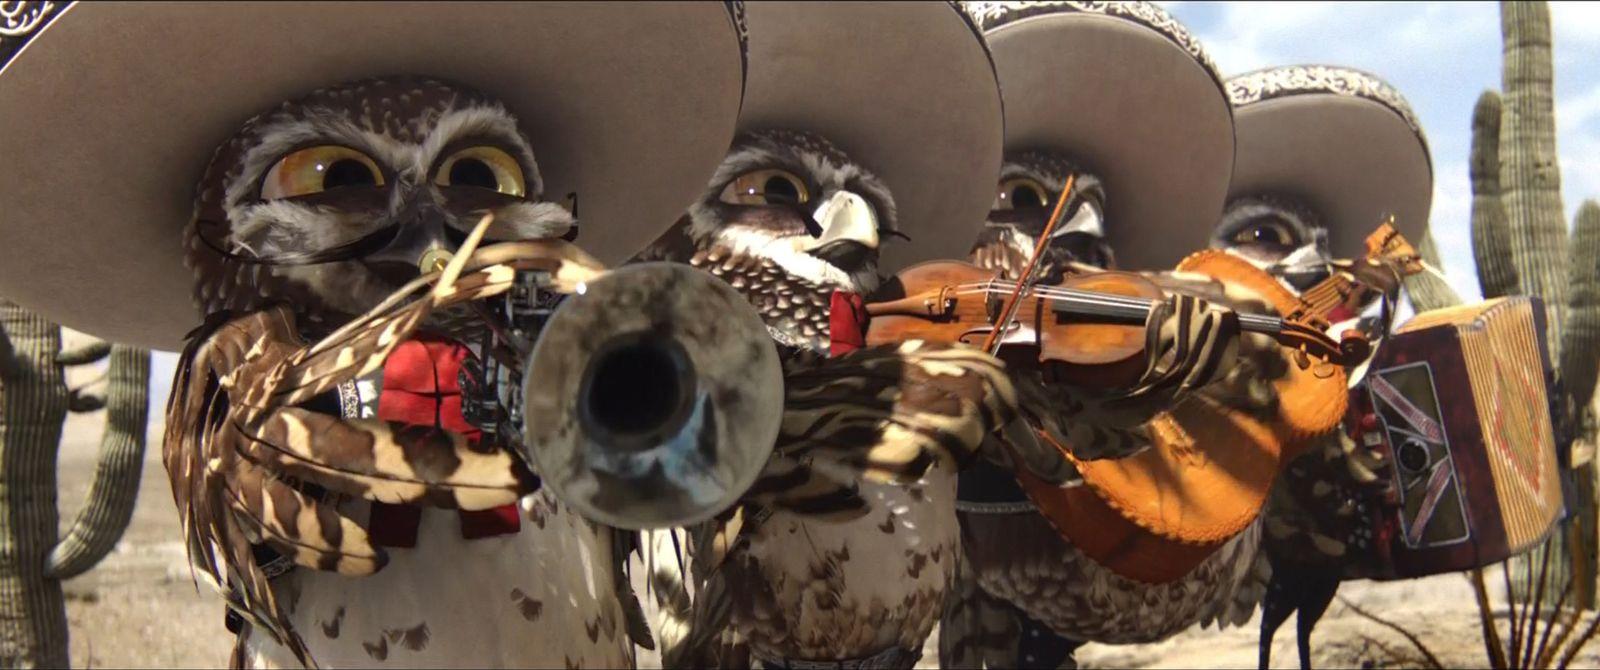 "Owl mariachi band from the movie ""Rango"" Wallpaper, Hd"